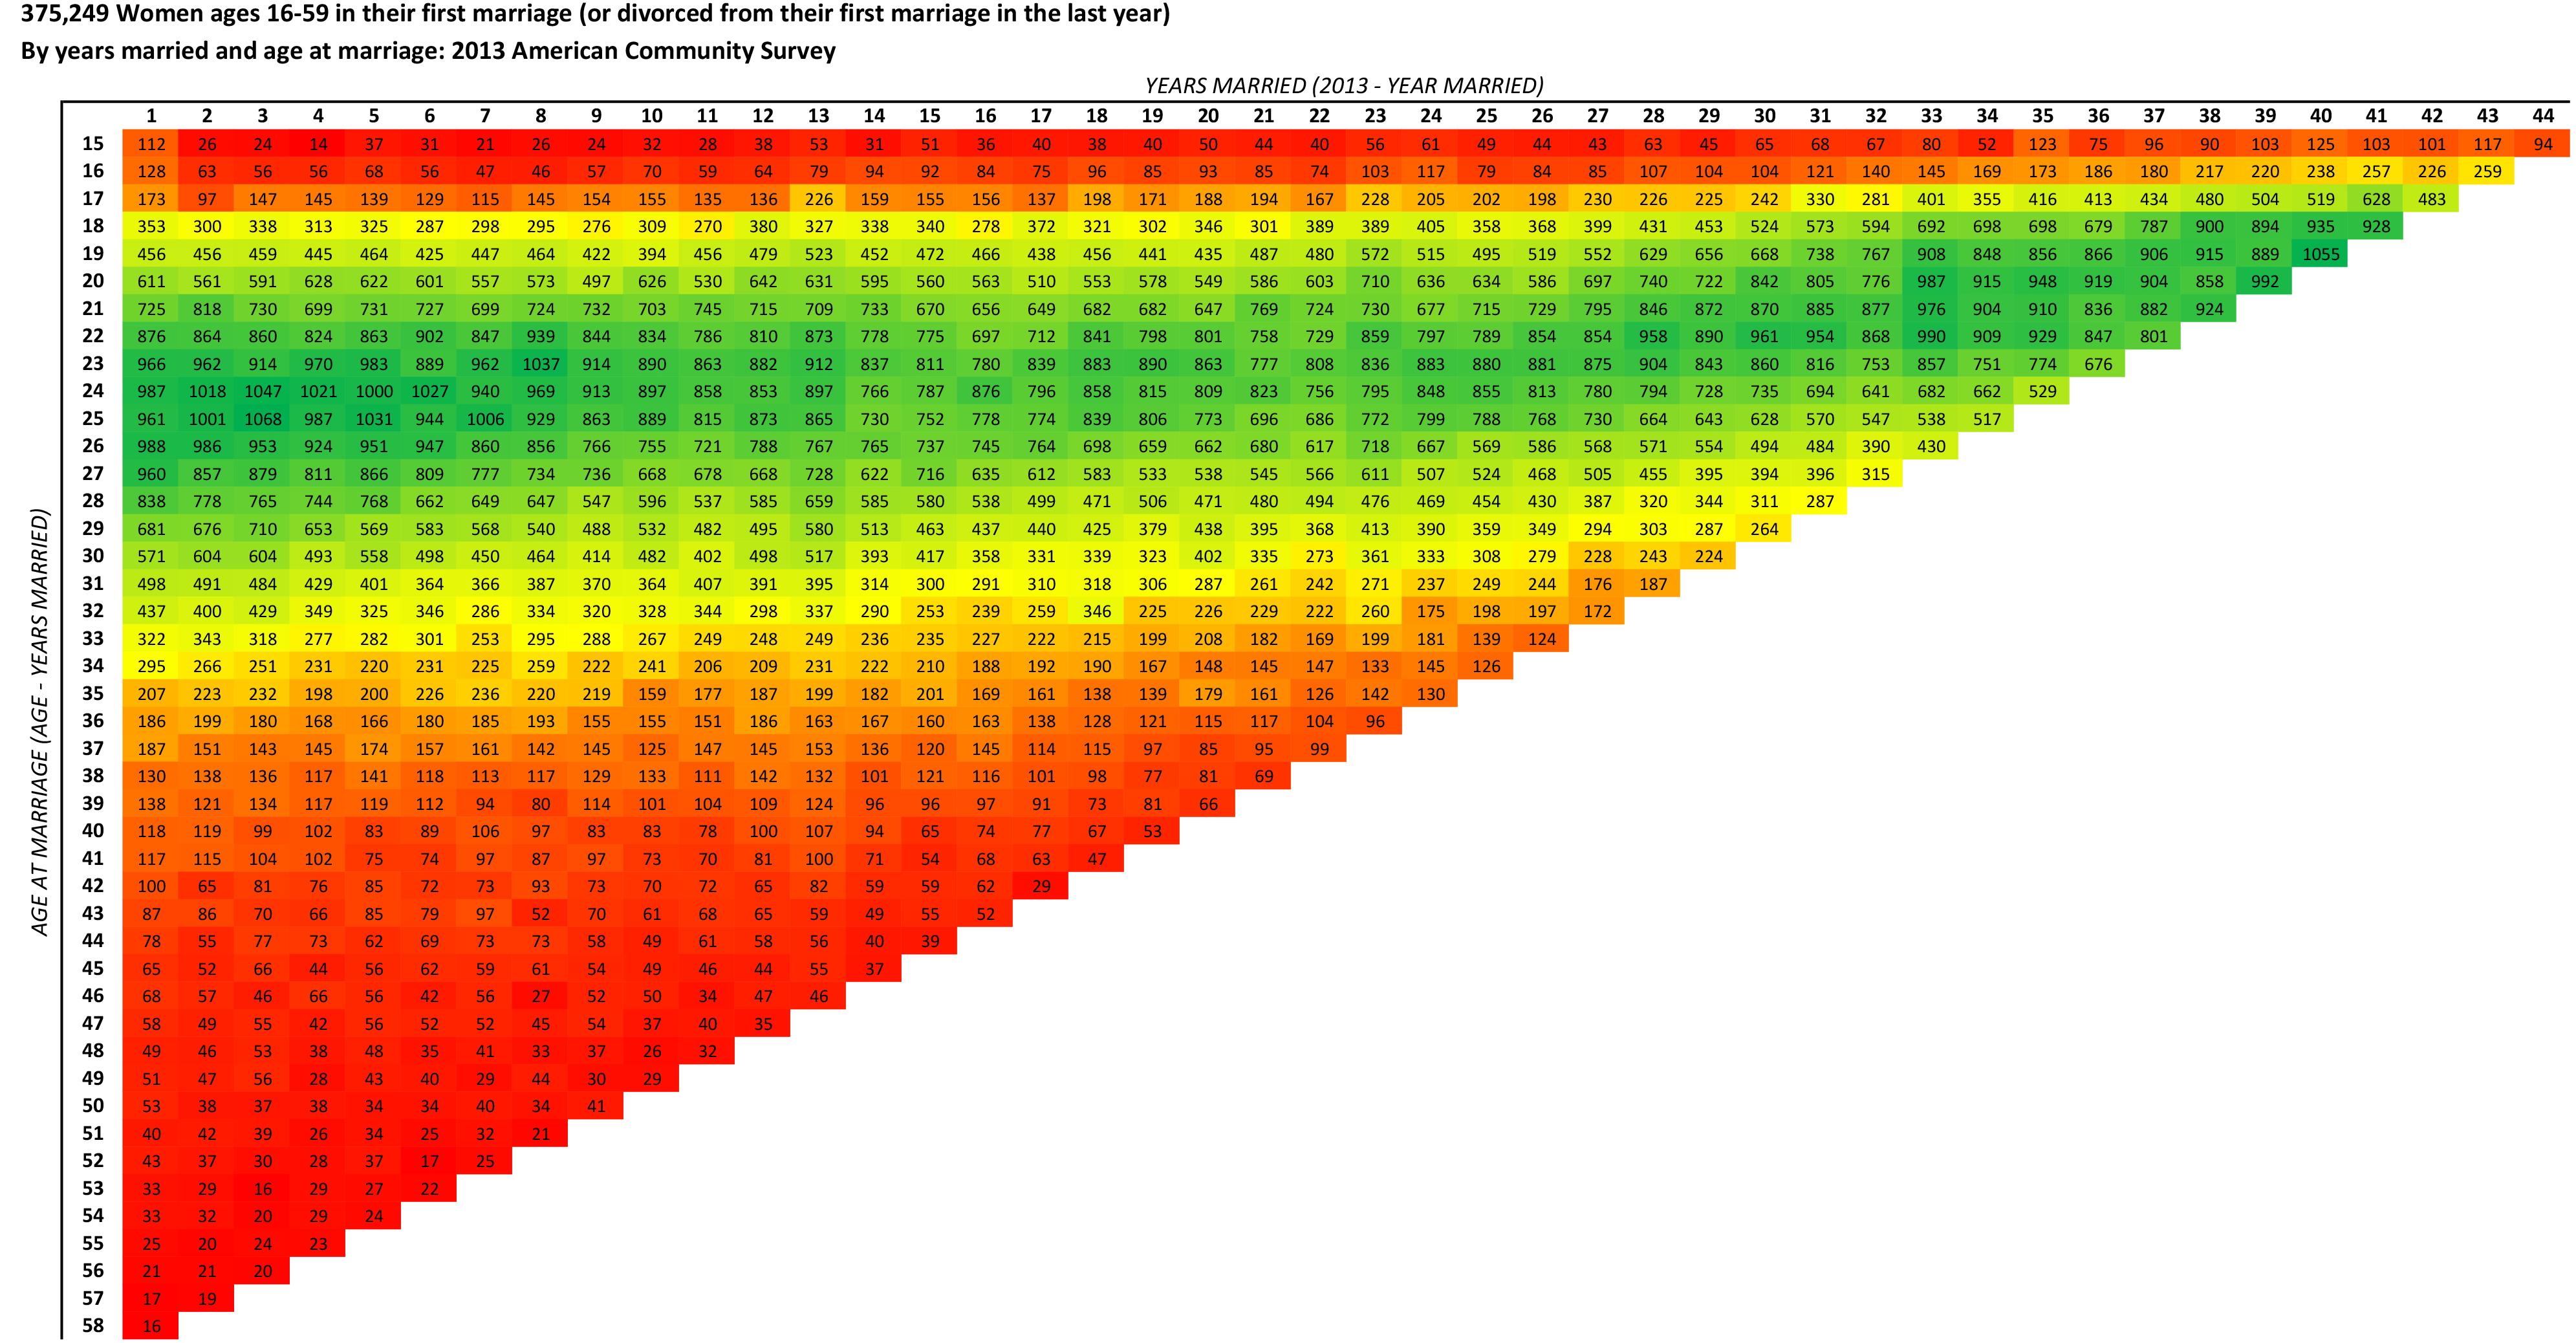 2011-2013 agemar figures.xlsx